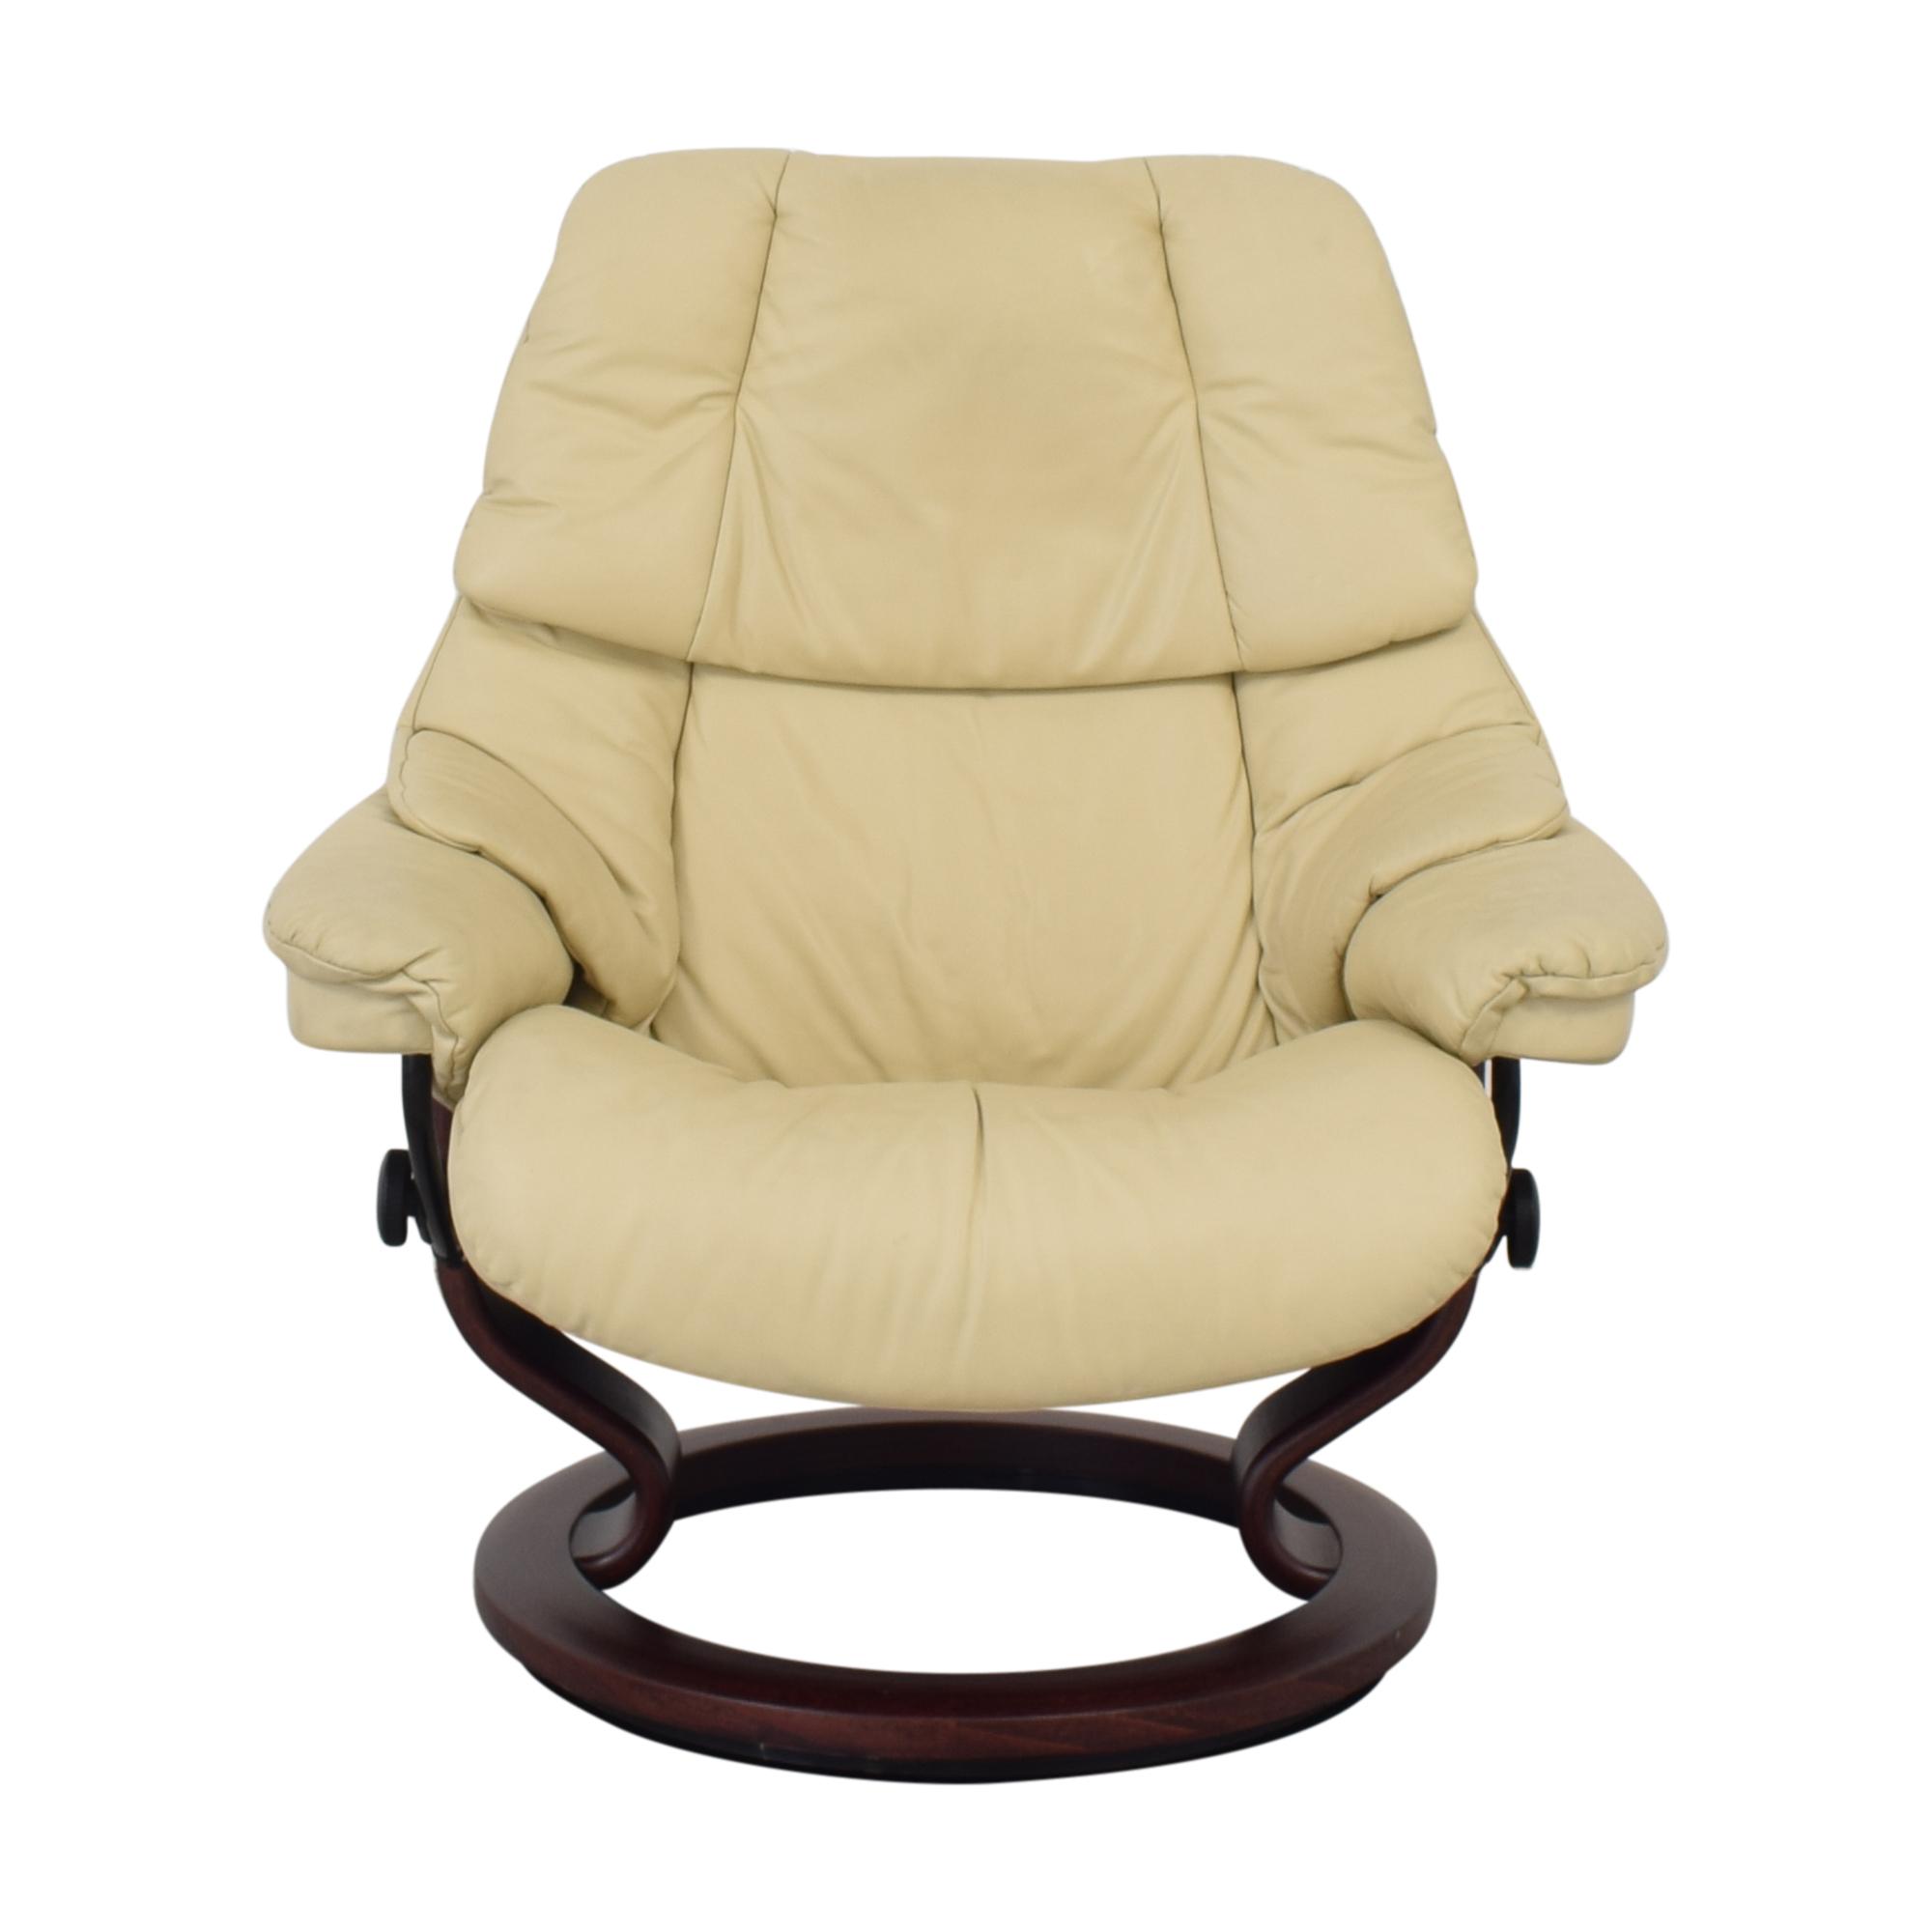 buy Ekornes Large Recliner and Footrest Ekornes Chairs